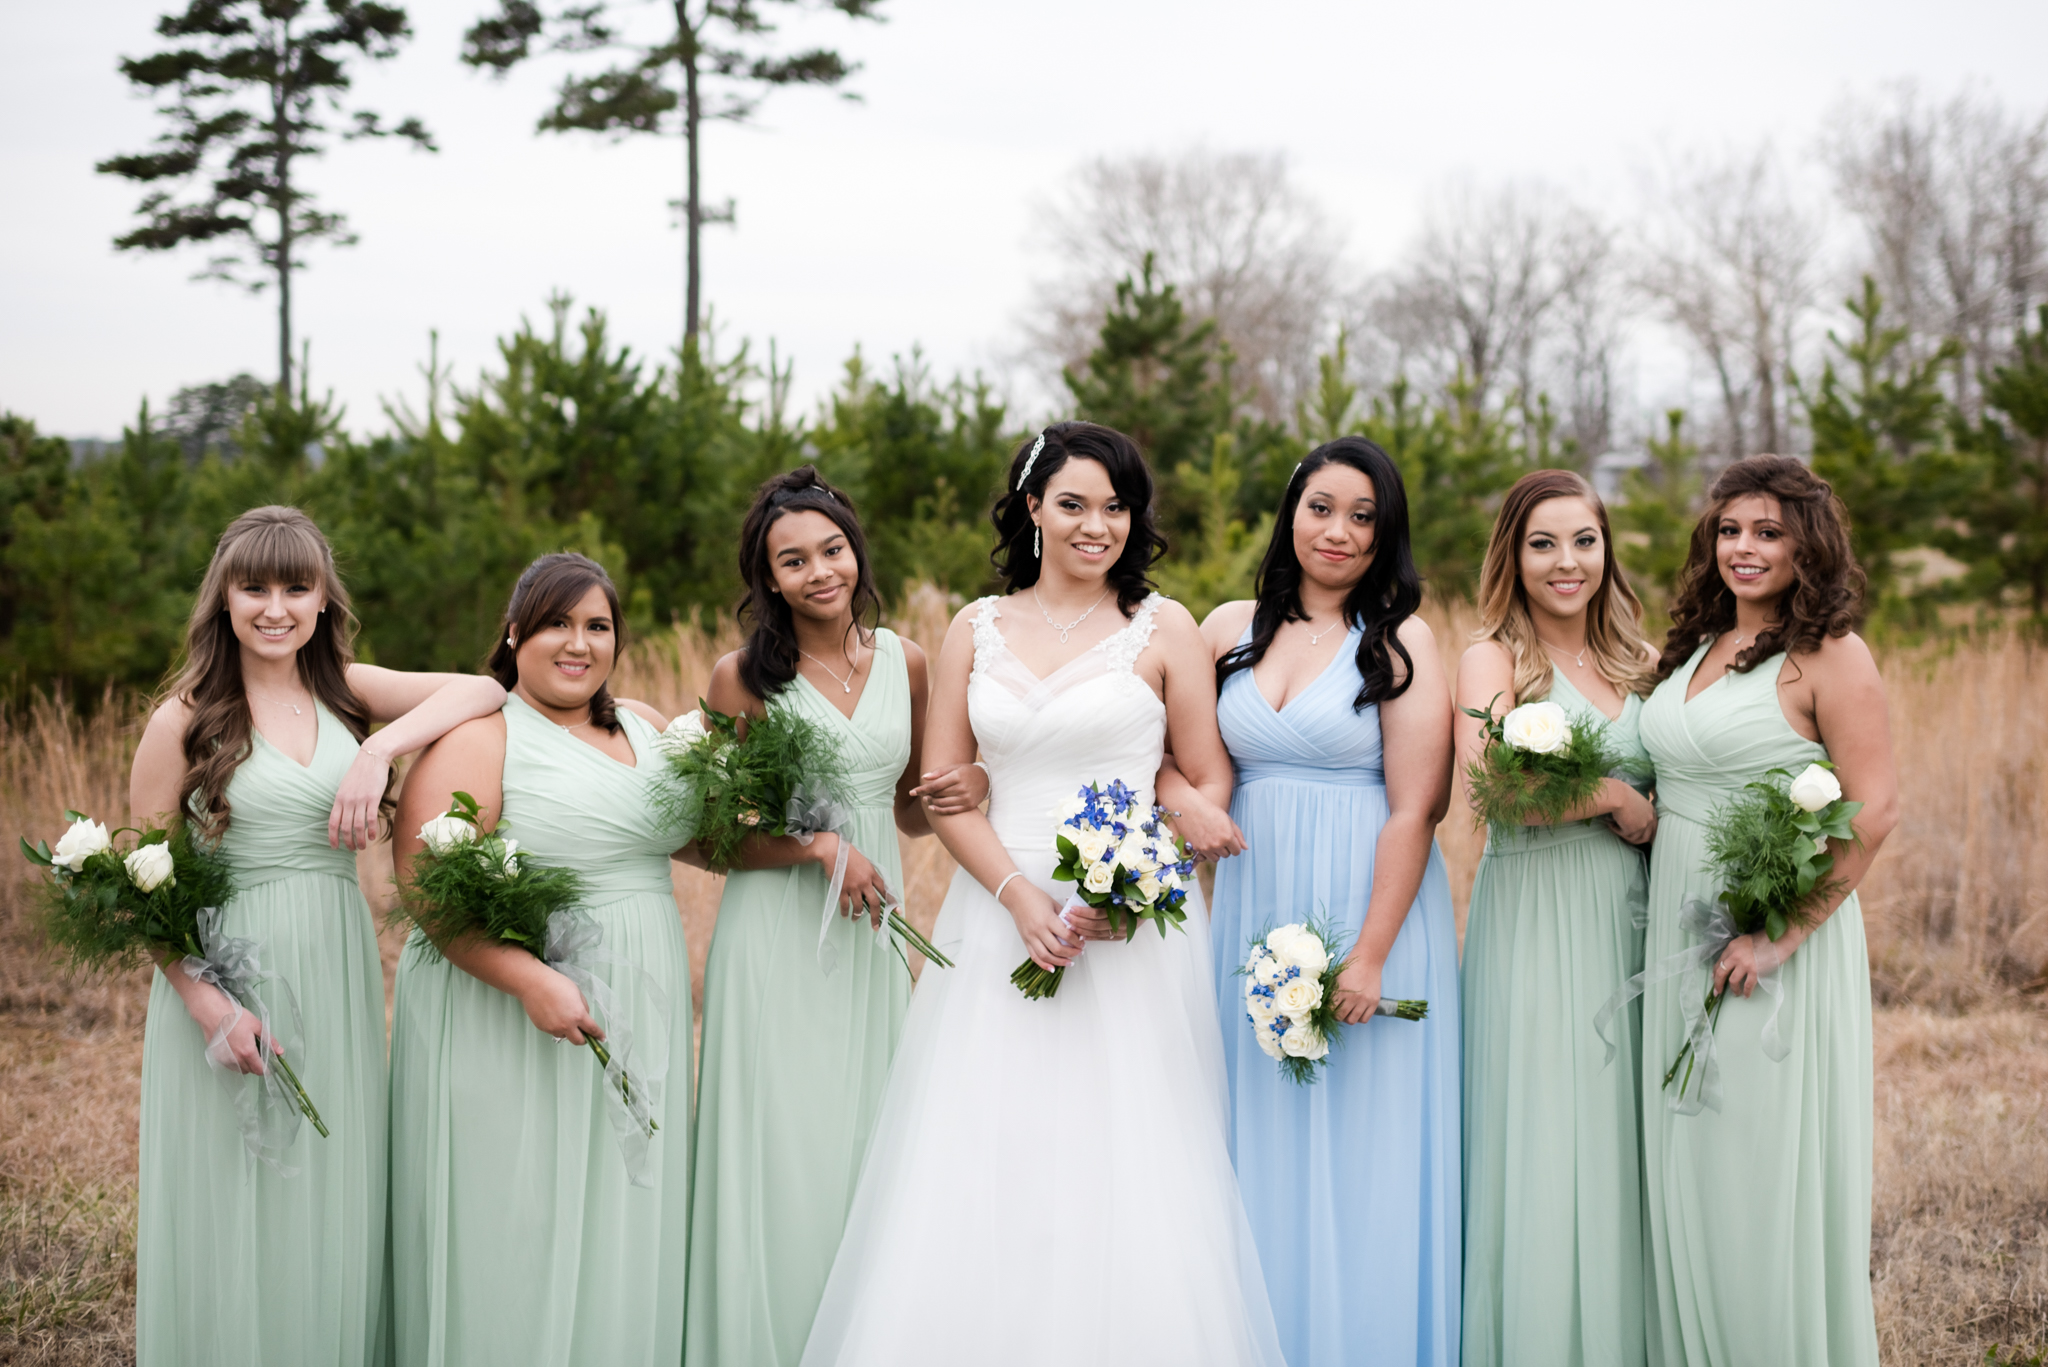 gibsonville-wedding-photography-013.jpg